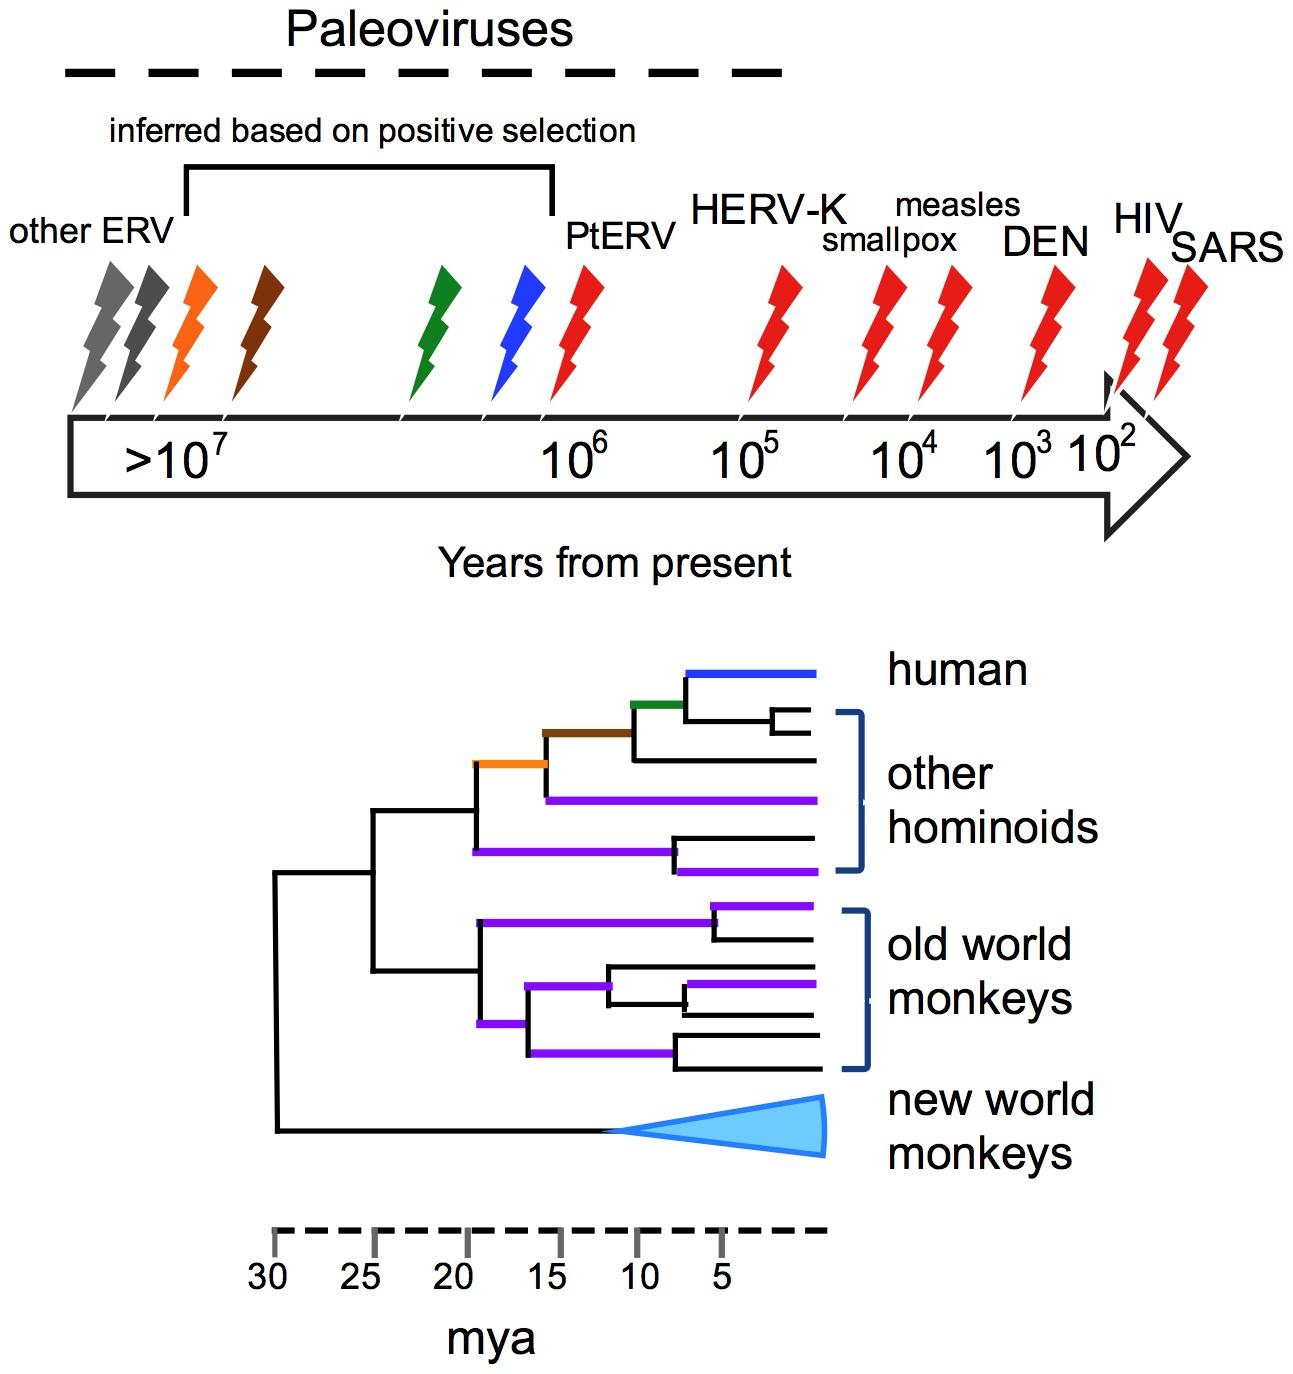 Paleoviruses